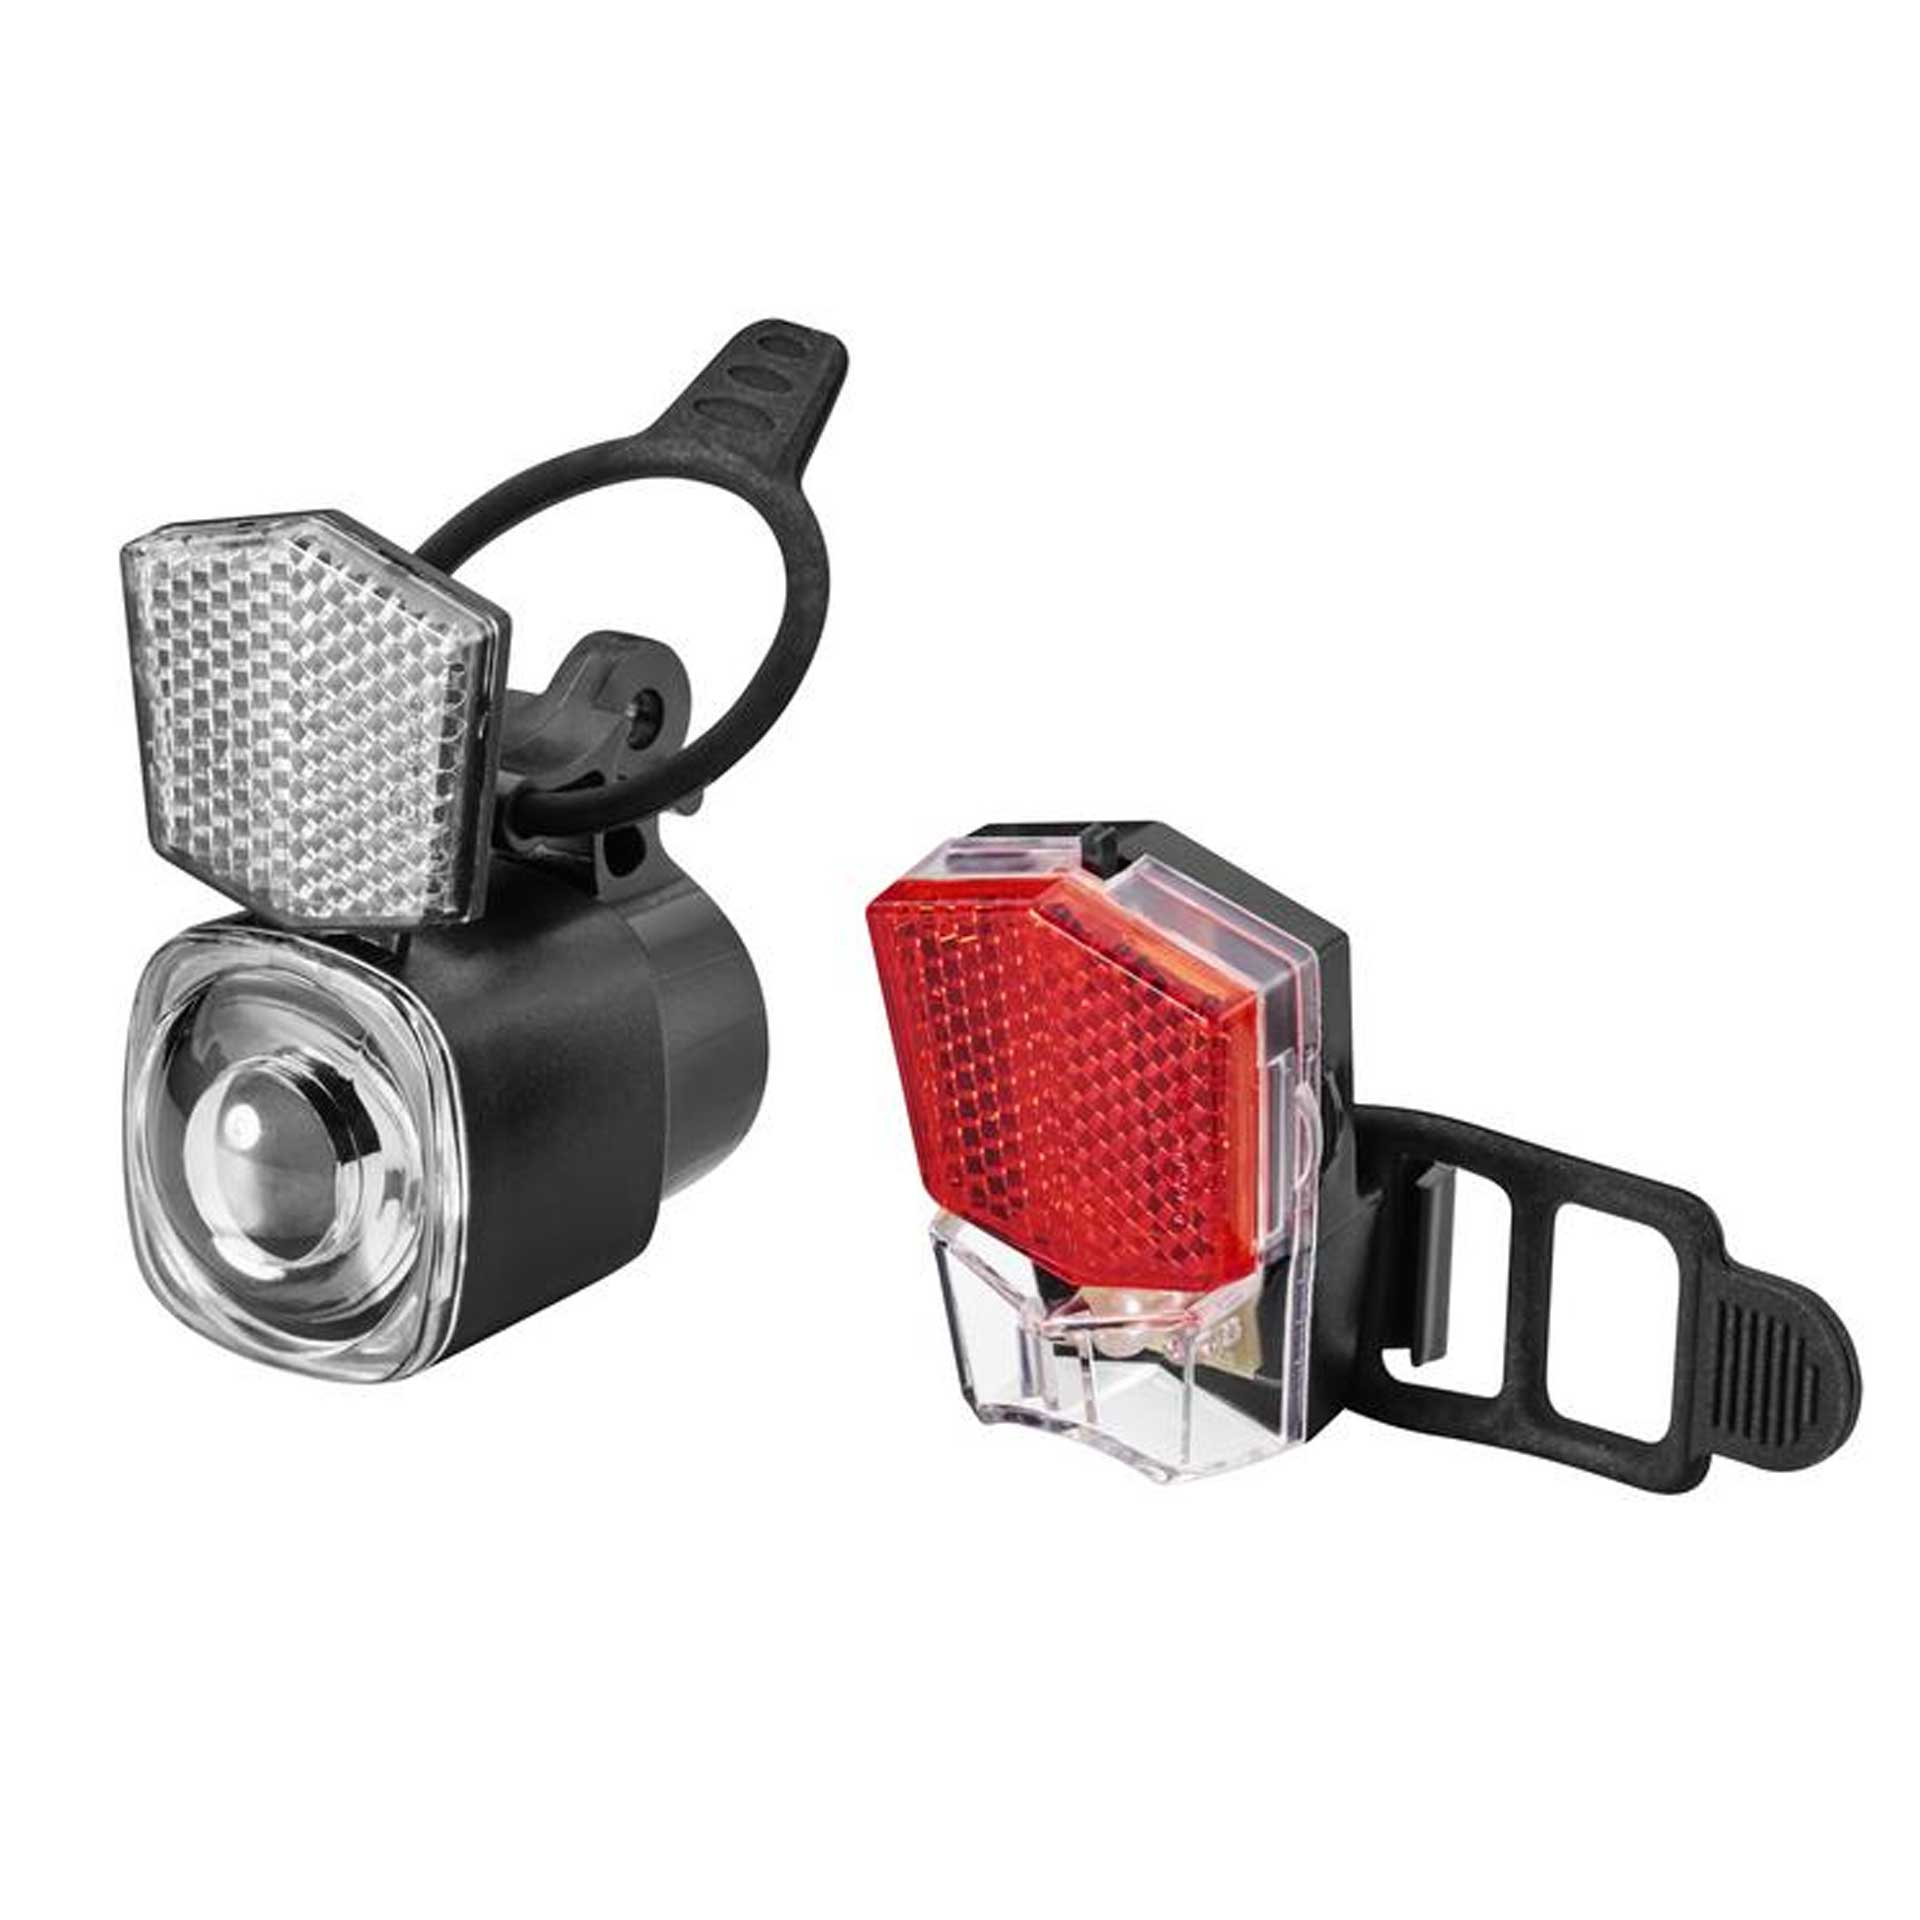 Mercedes-Benz Fahrrad LED-Lichtset